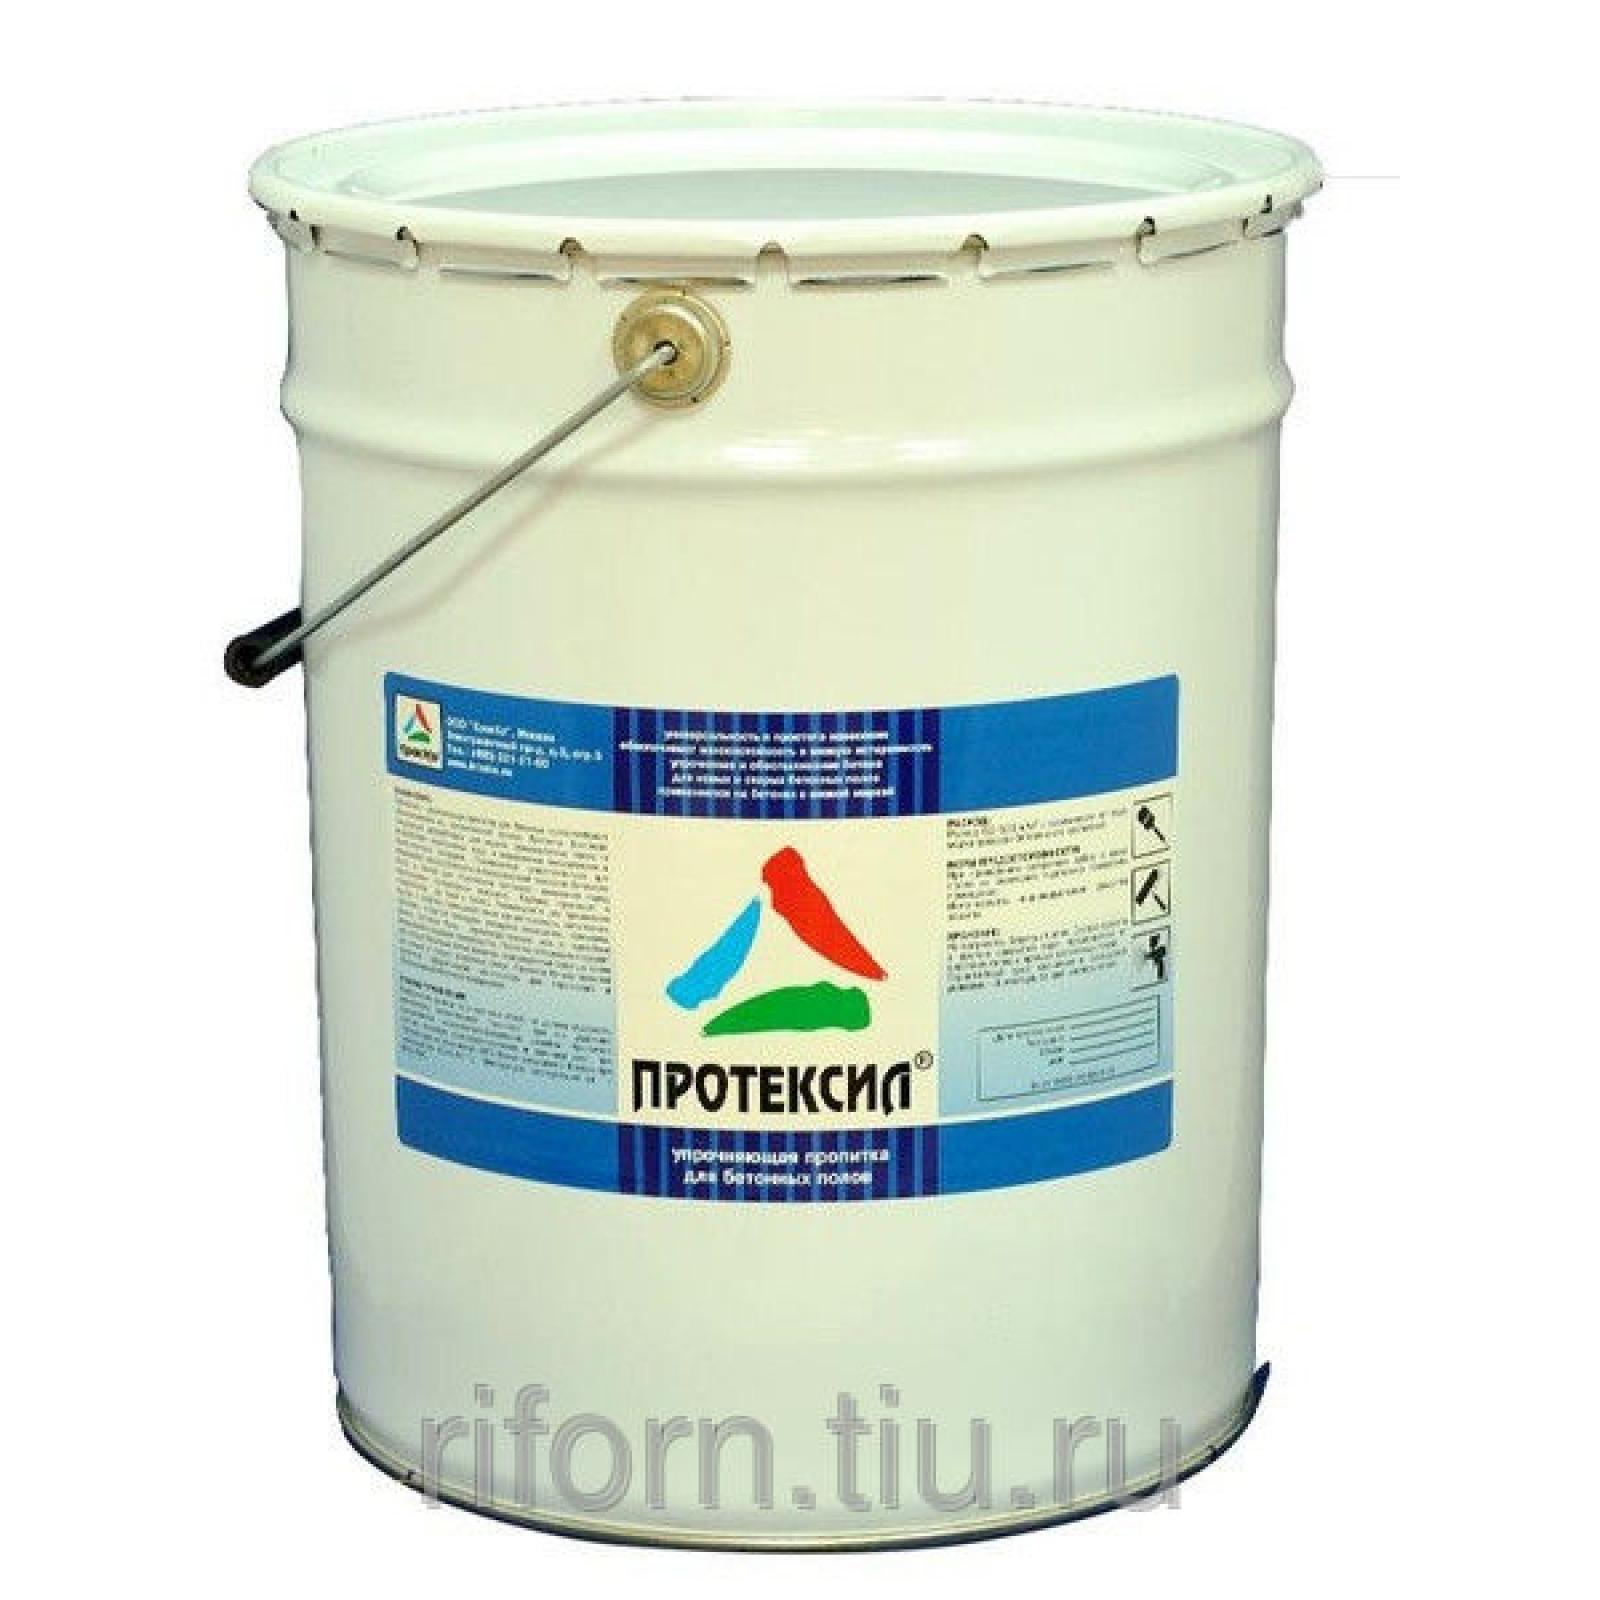 Глубокая пропитка для бетона купить бетон темп